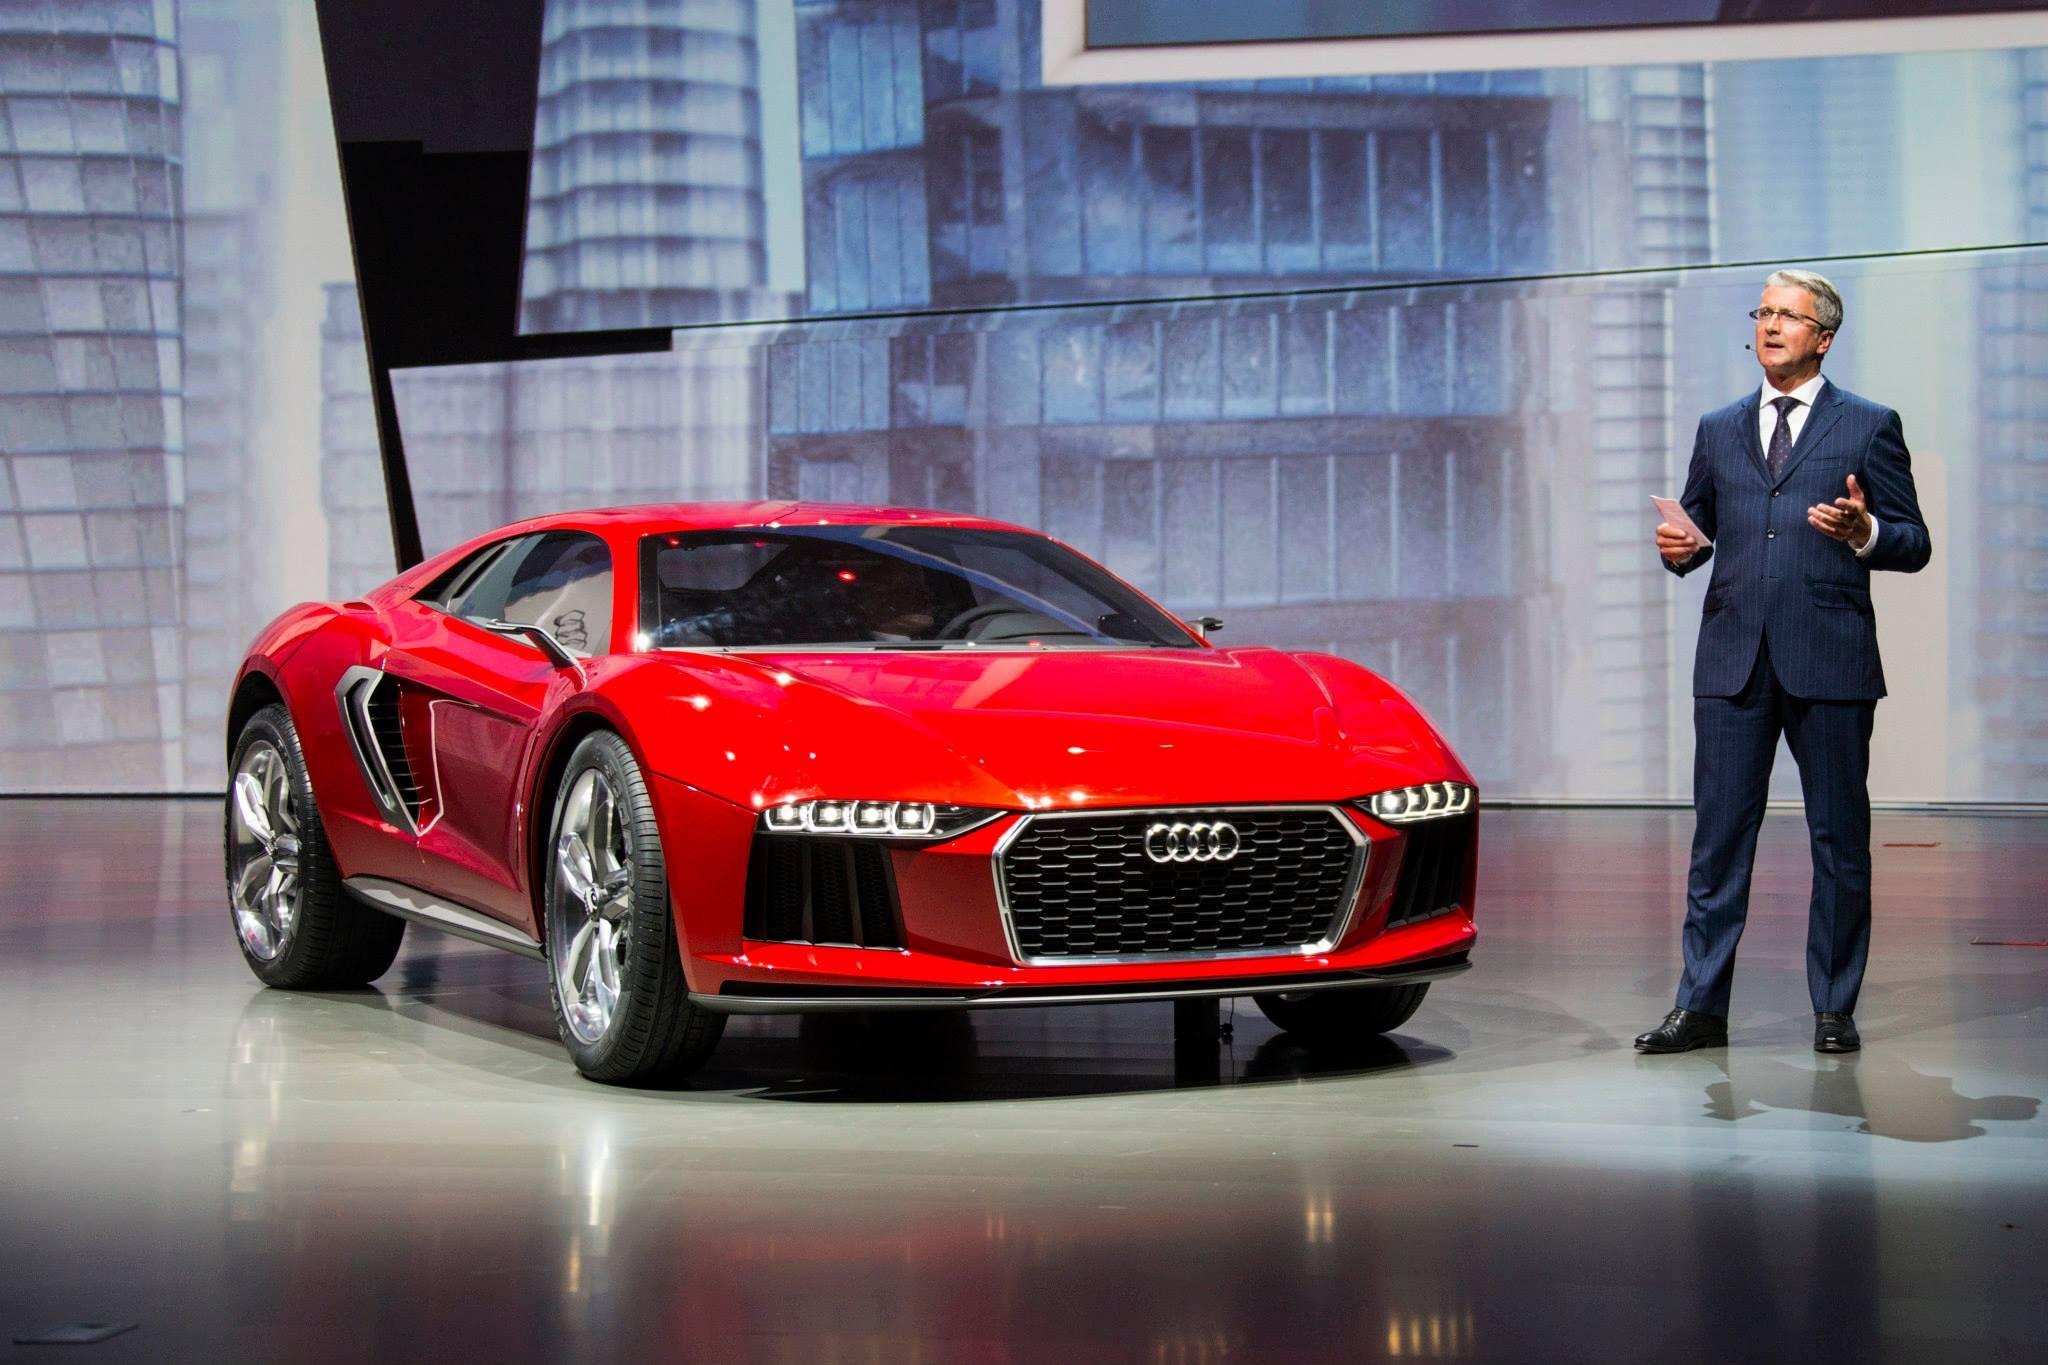 Audi Concept Vehicles at Frankfurt/IAA 2013